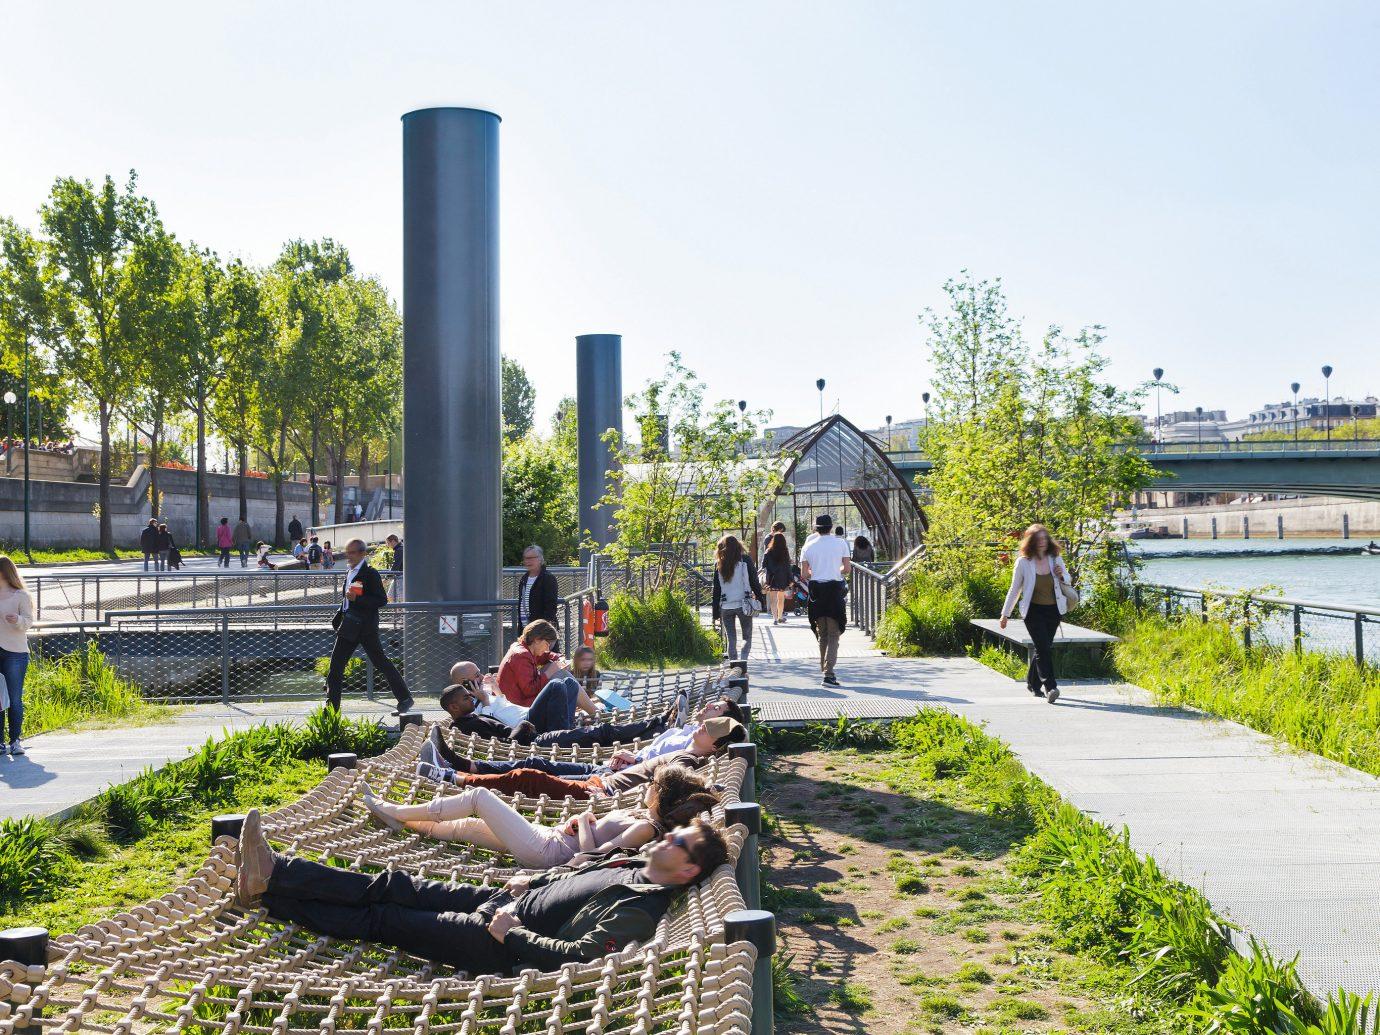 Romance Trip Ideas sky outdoor transport urban area vacation tourism Garden park waterway town square Playground